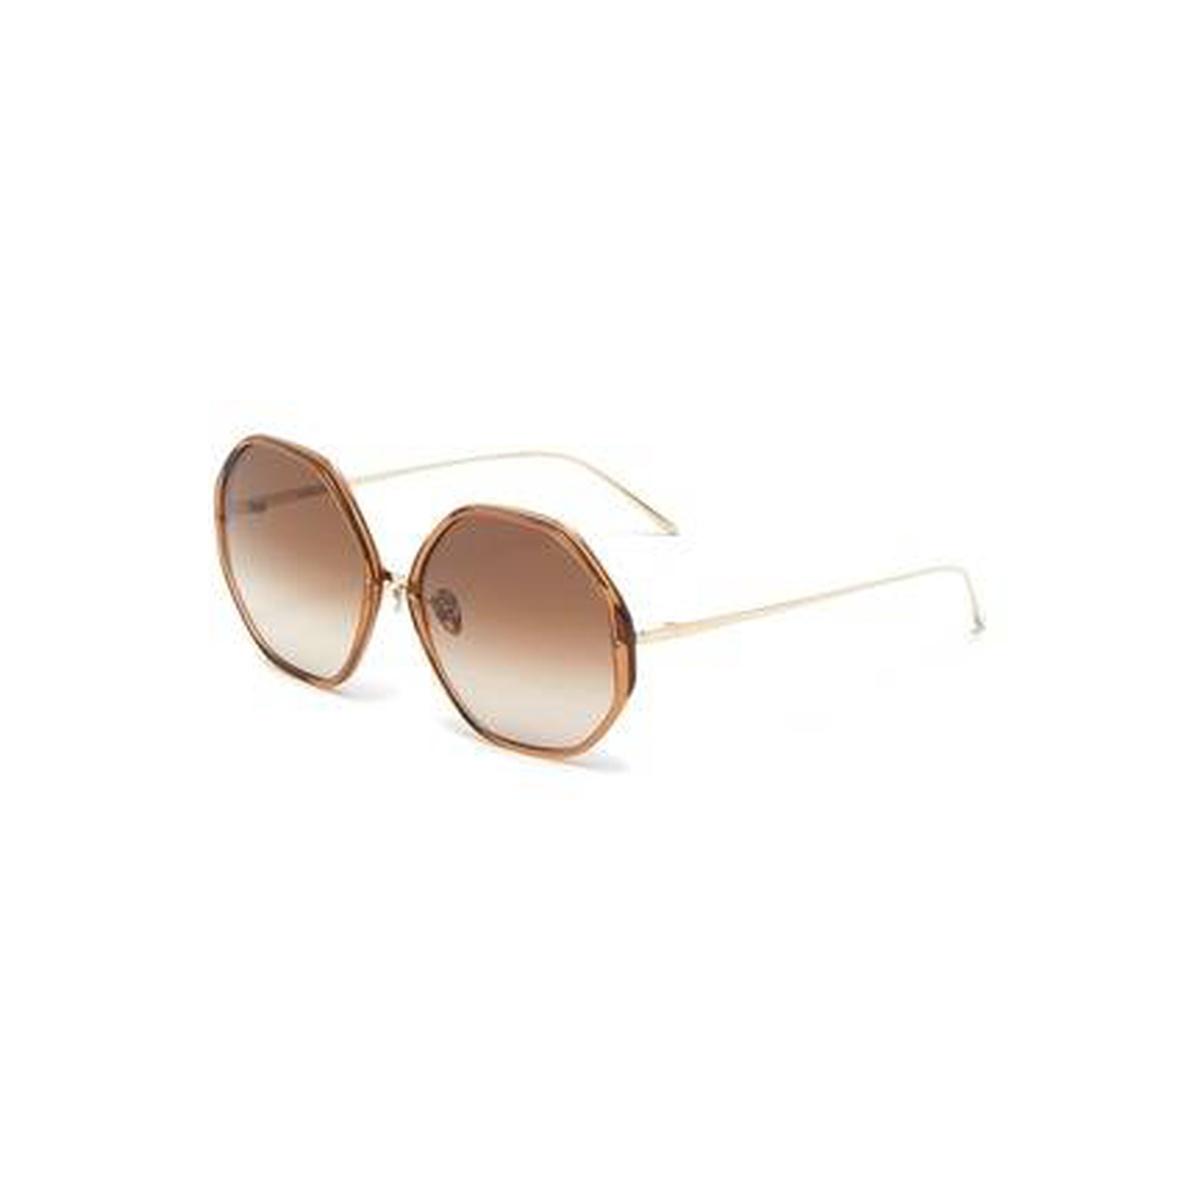 Linda Farrow 'Alona' Duo-tonal Frame 超大号六边形太阳眼镜